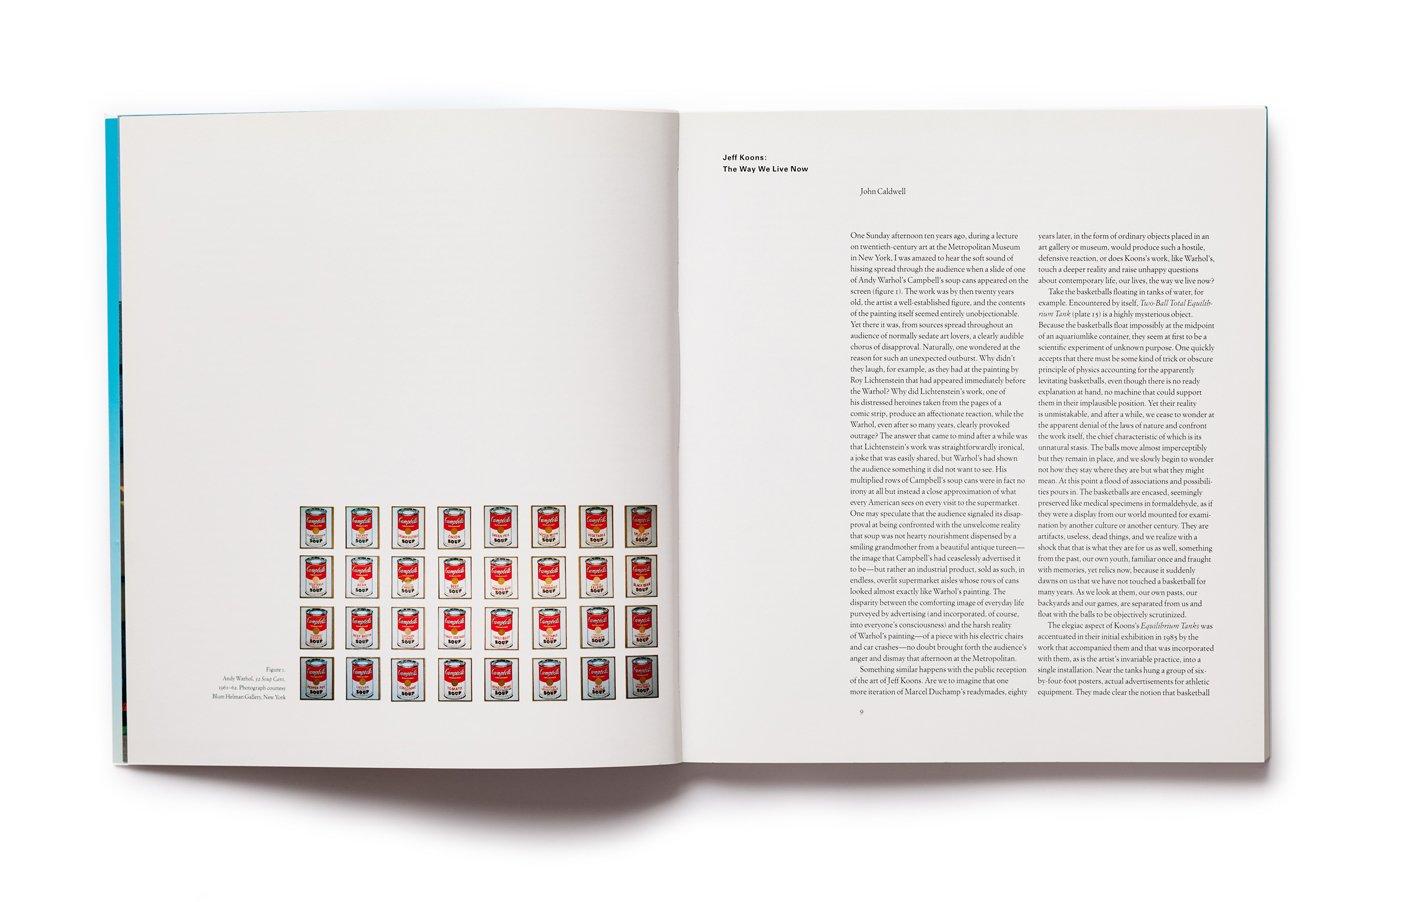 Jeff Koons, pp. 8-9